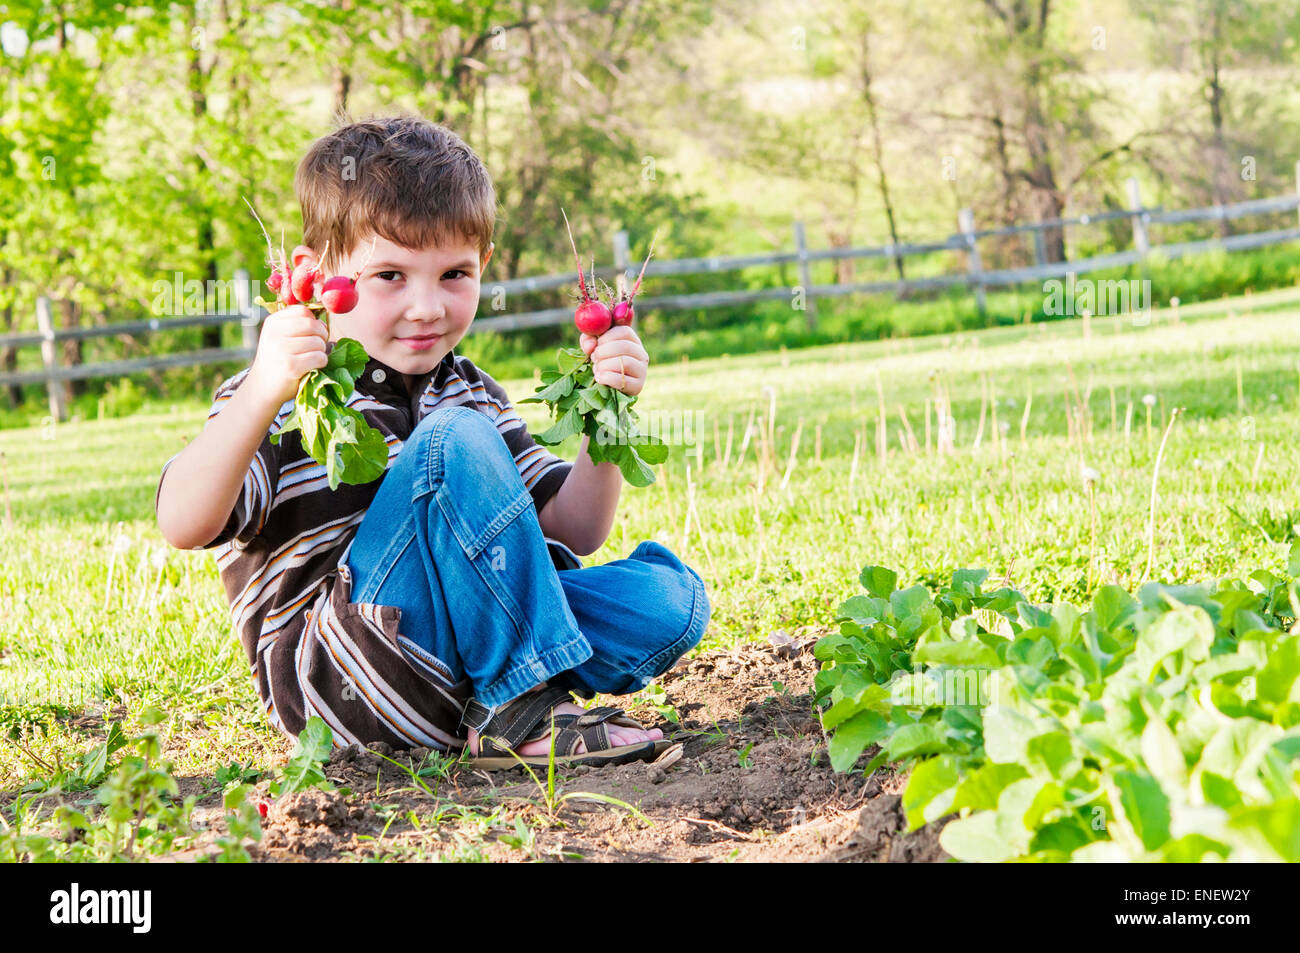 Boy holding radishes tiré de jardin Photo Stock